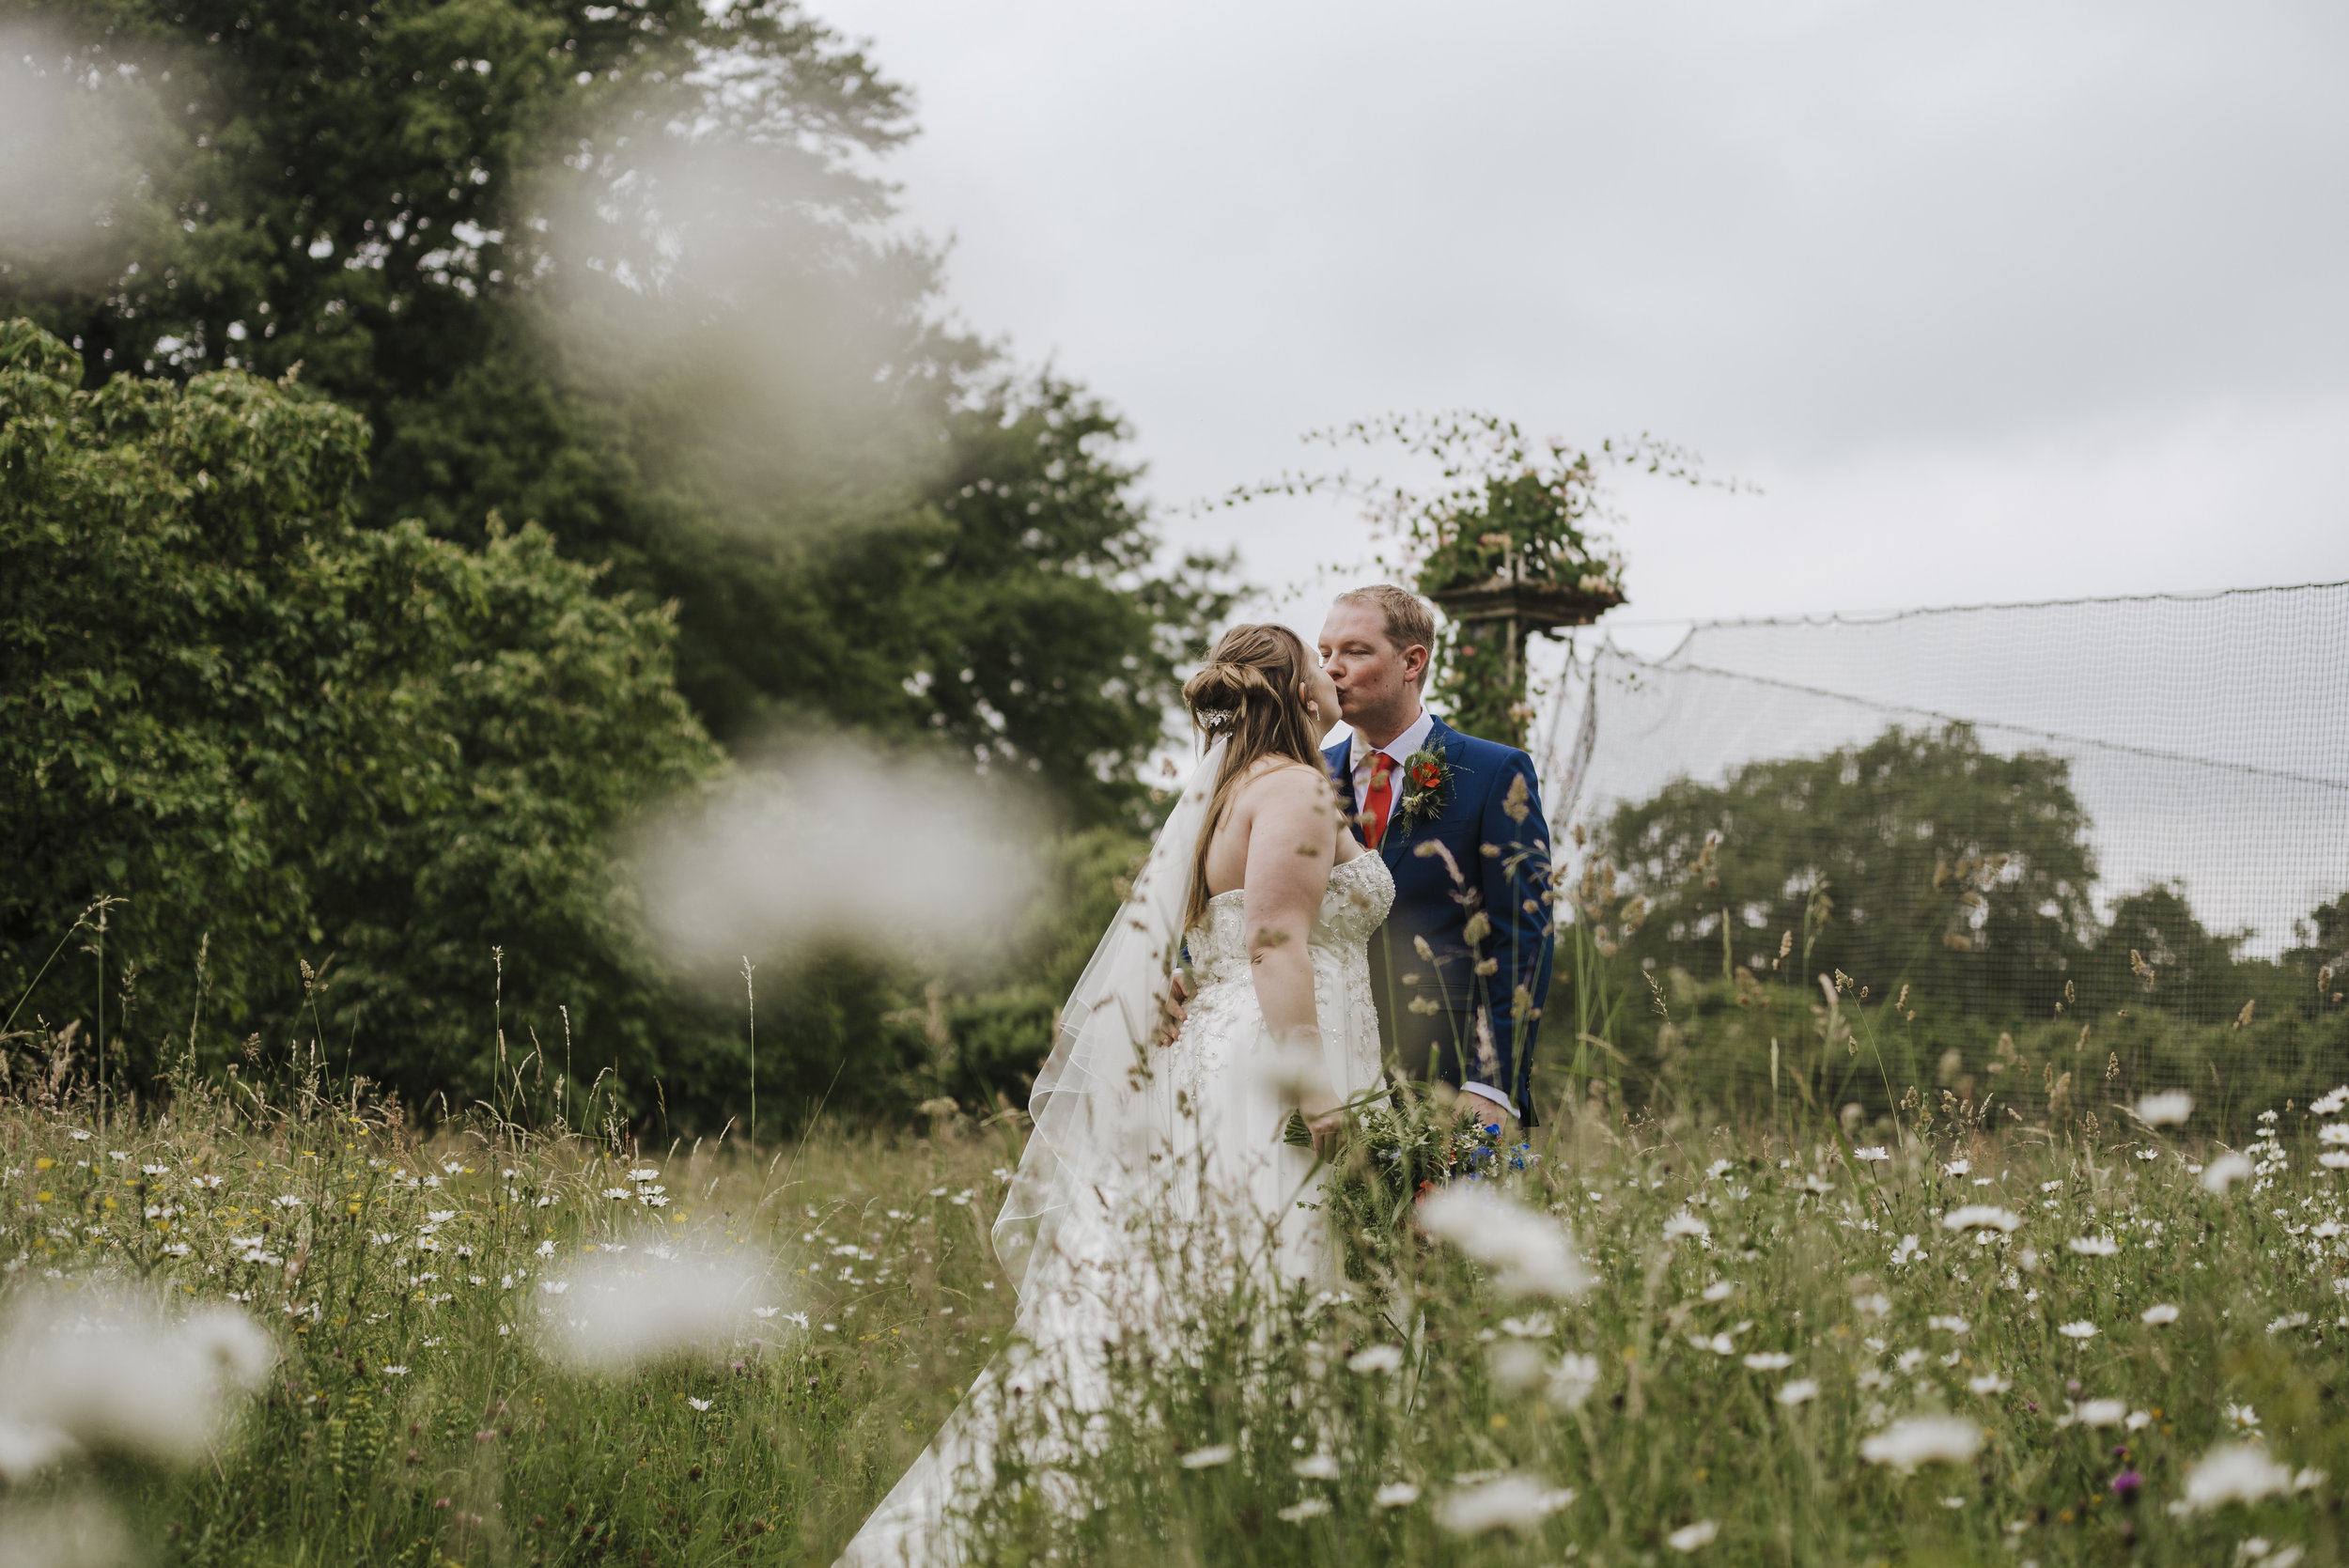 Konjo-Photography-Essex-Suffolk-Norfolk-Wedding-Photographer-And-Videographer-Wedding-Videography (29).JPG